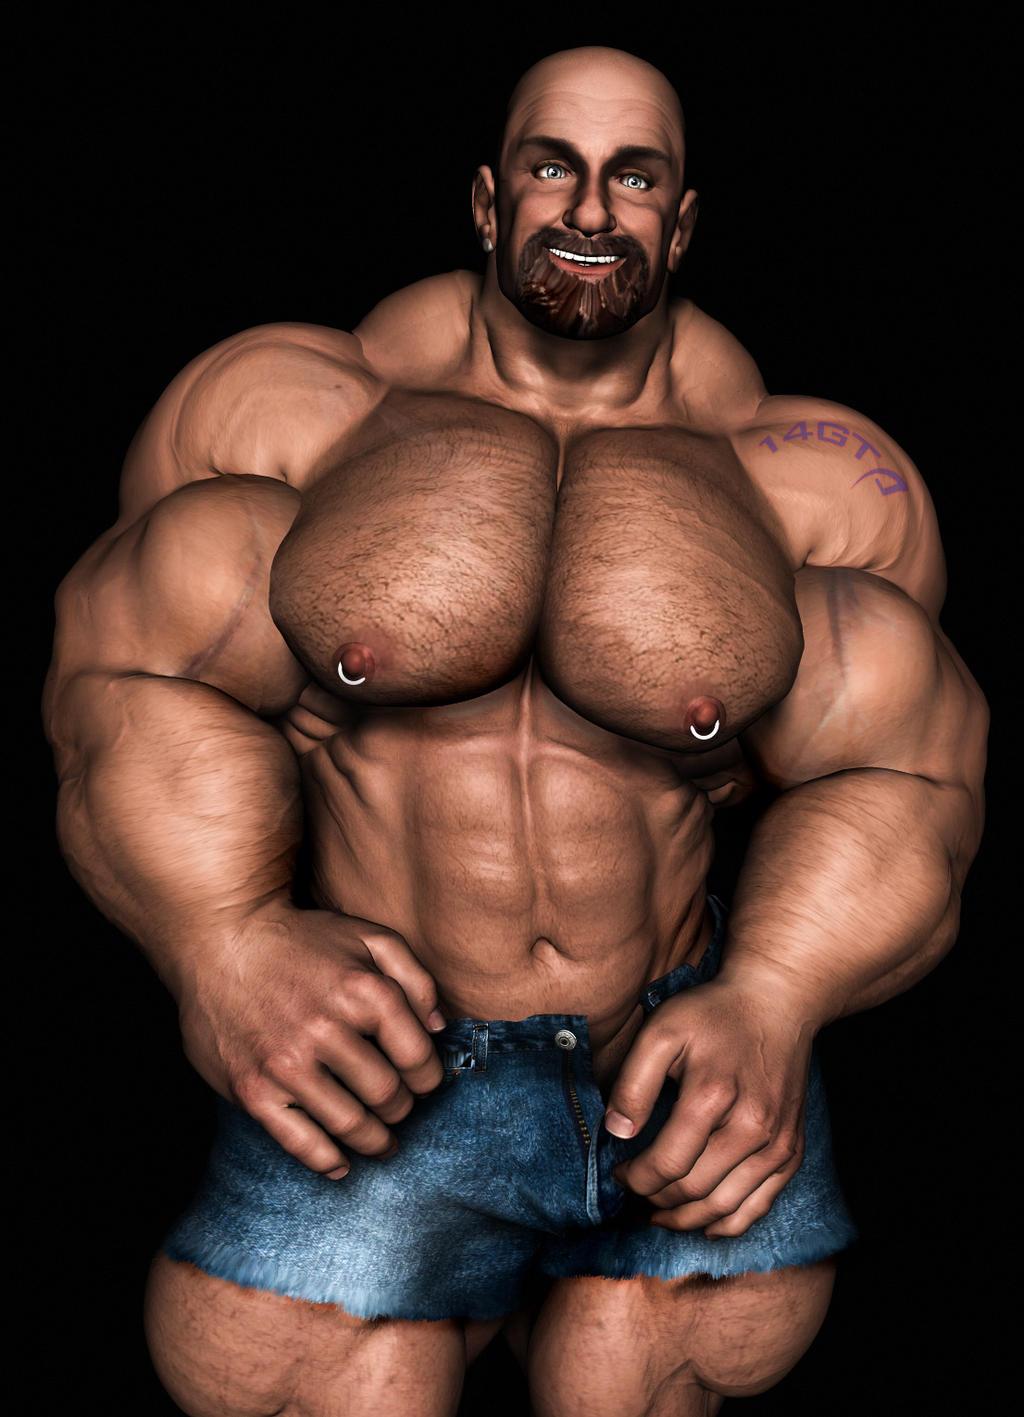 Big guns gay porn